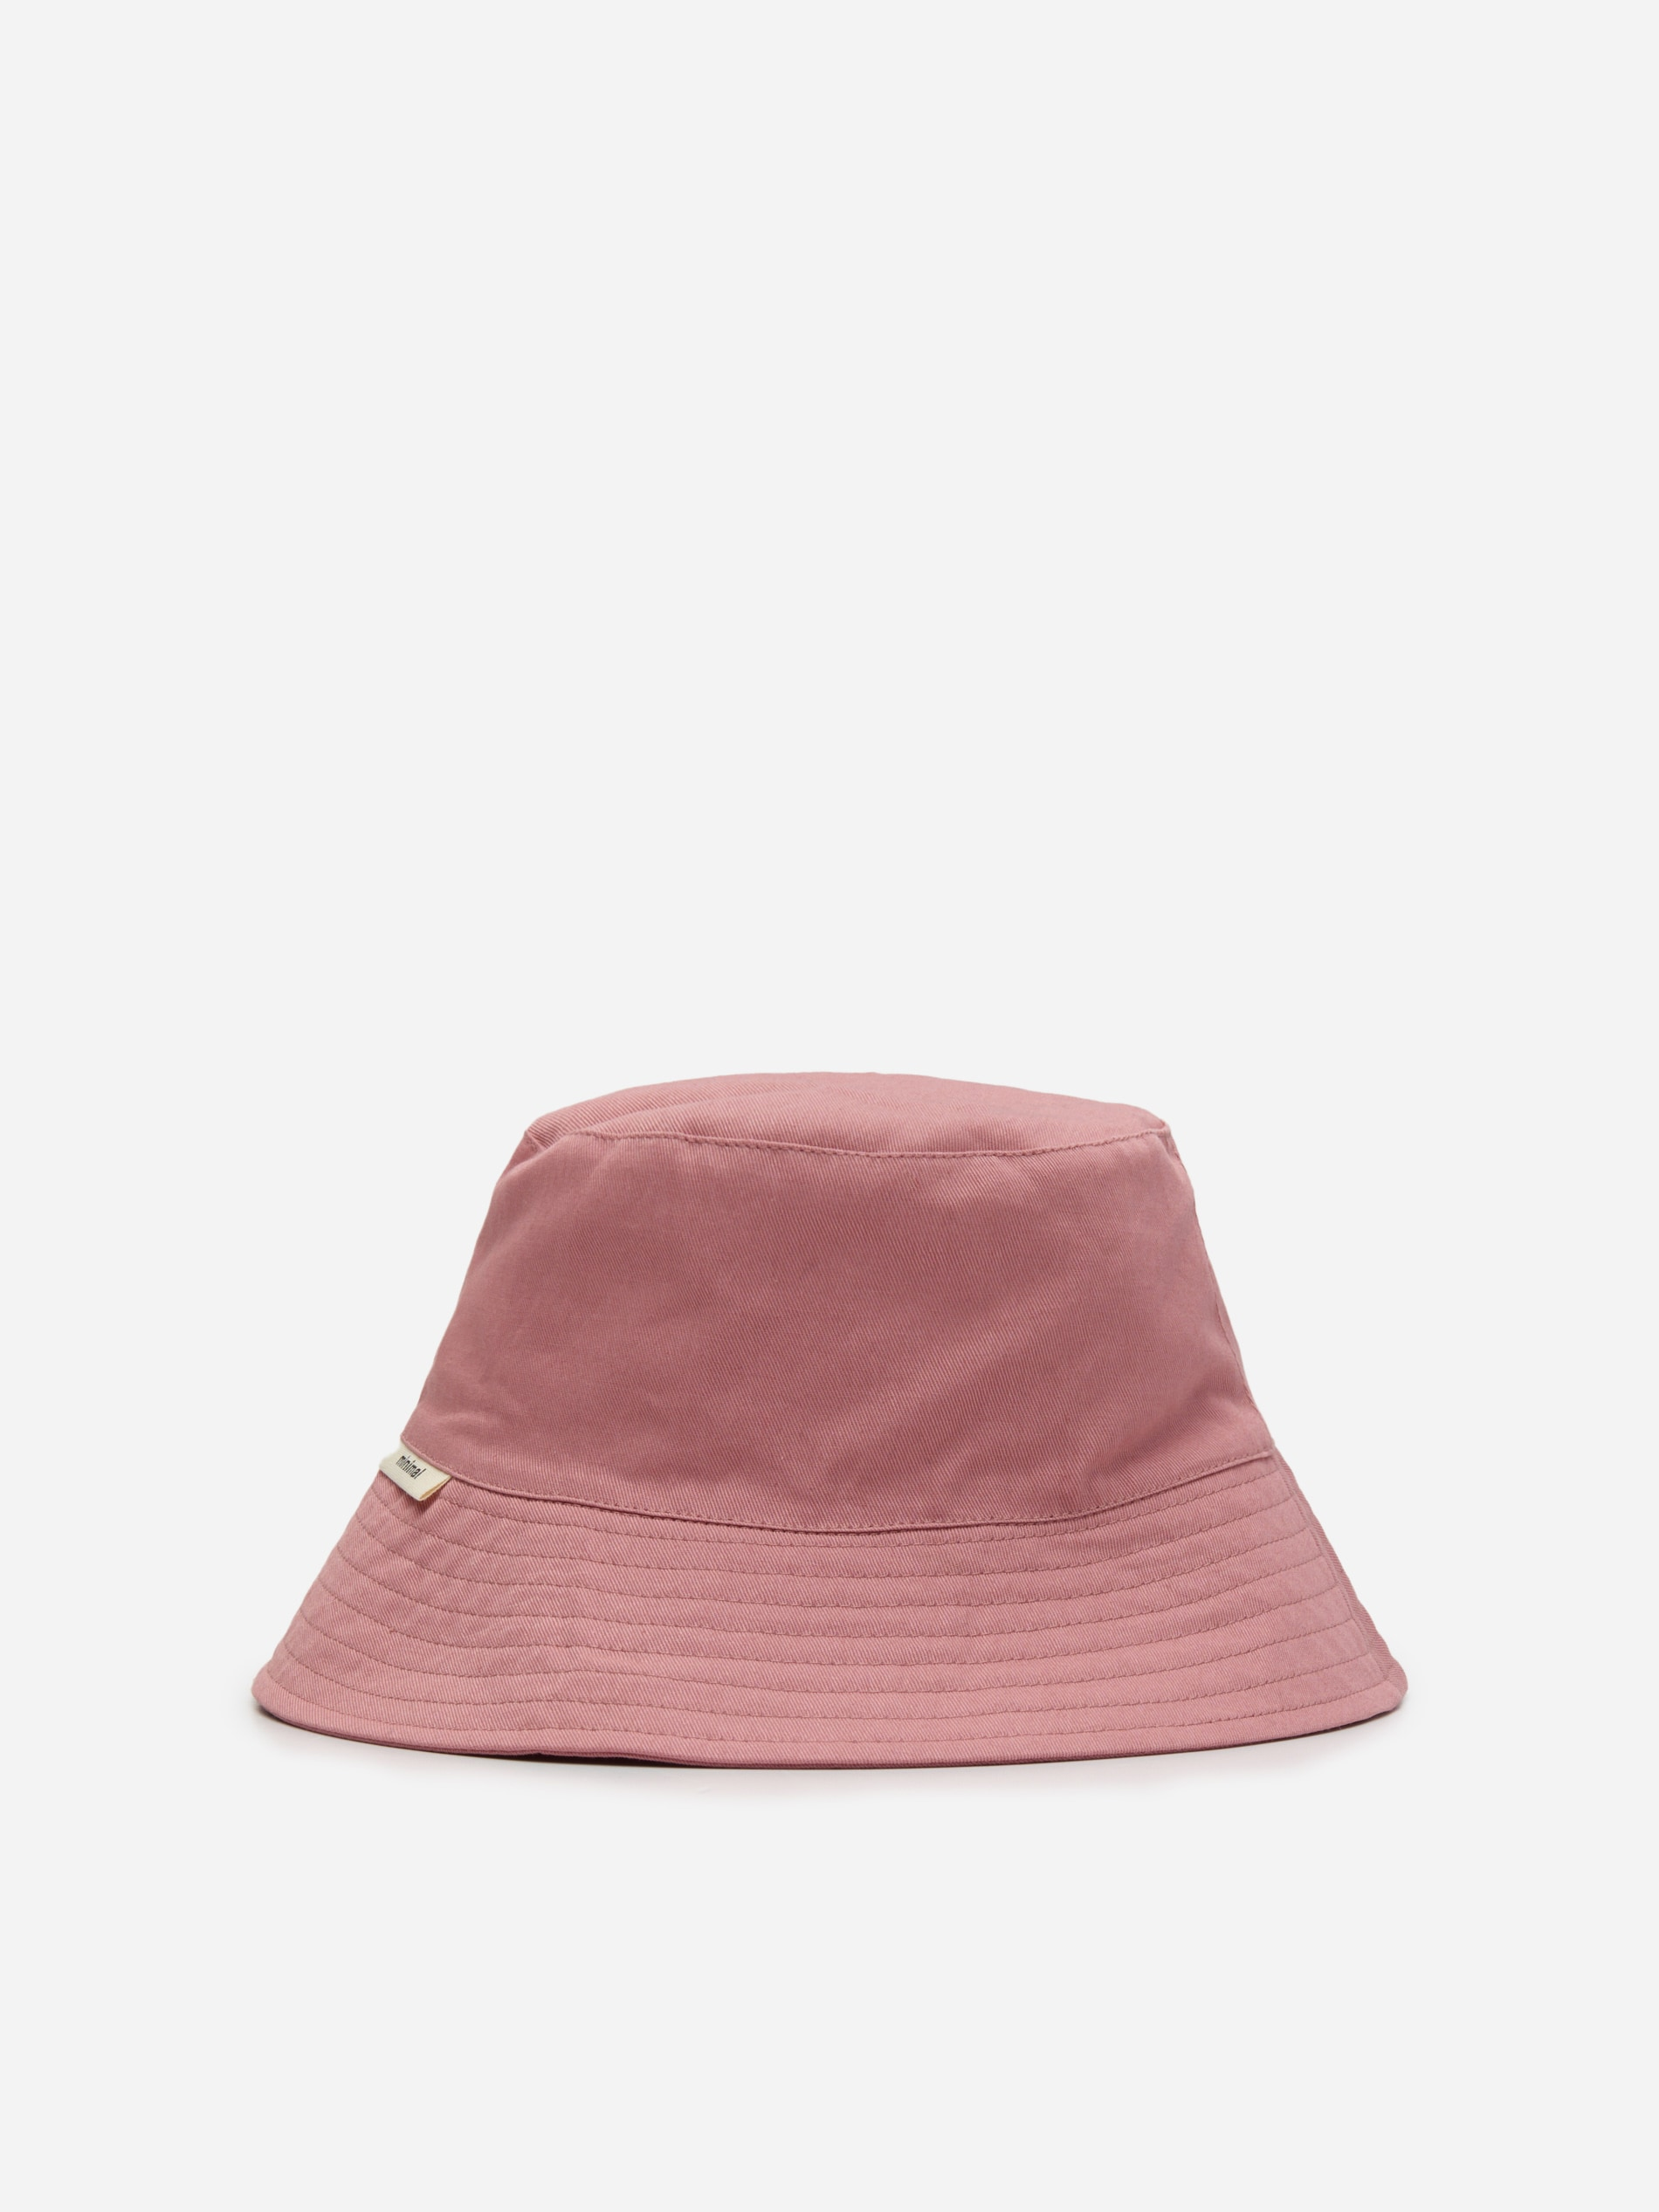 Klobúk typu bucket - pastel pink - 5005E-03X - HOUSE - 1